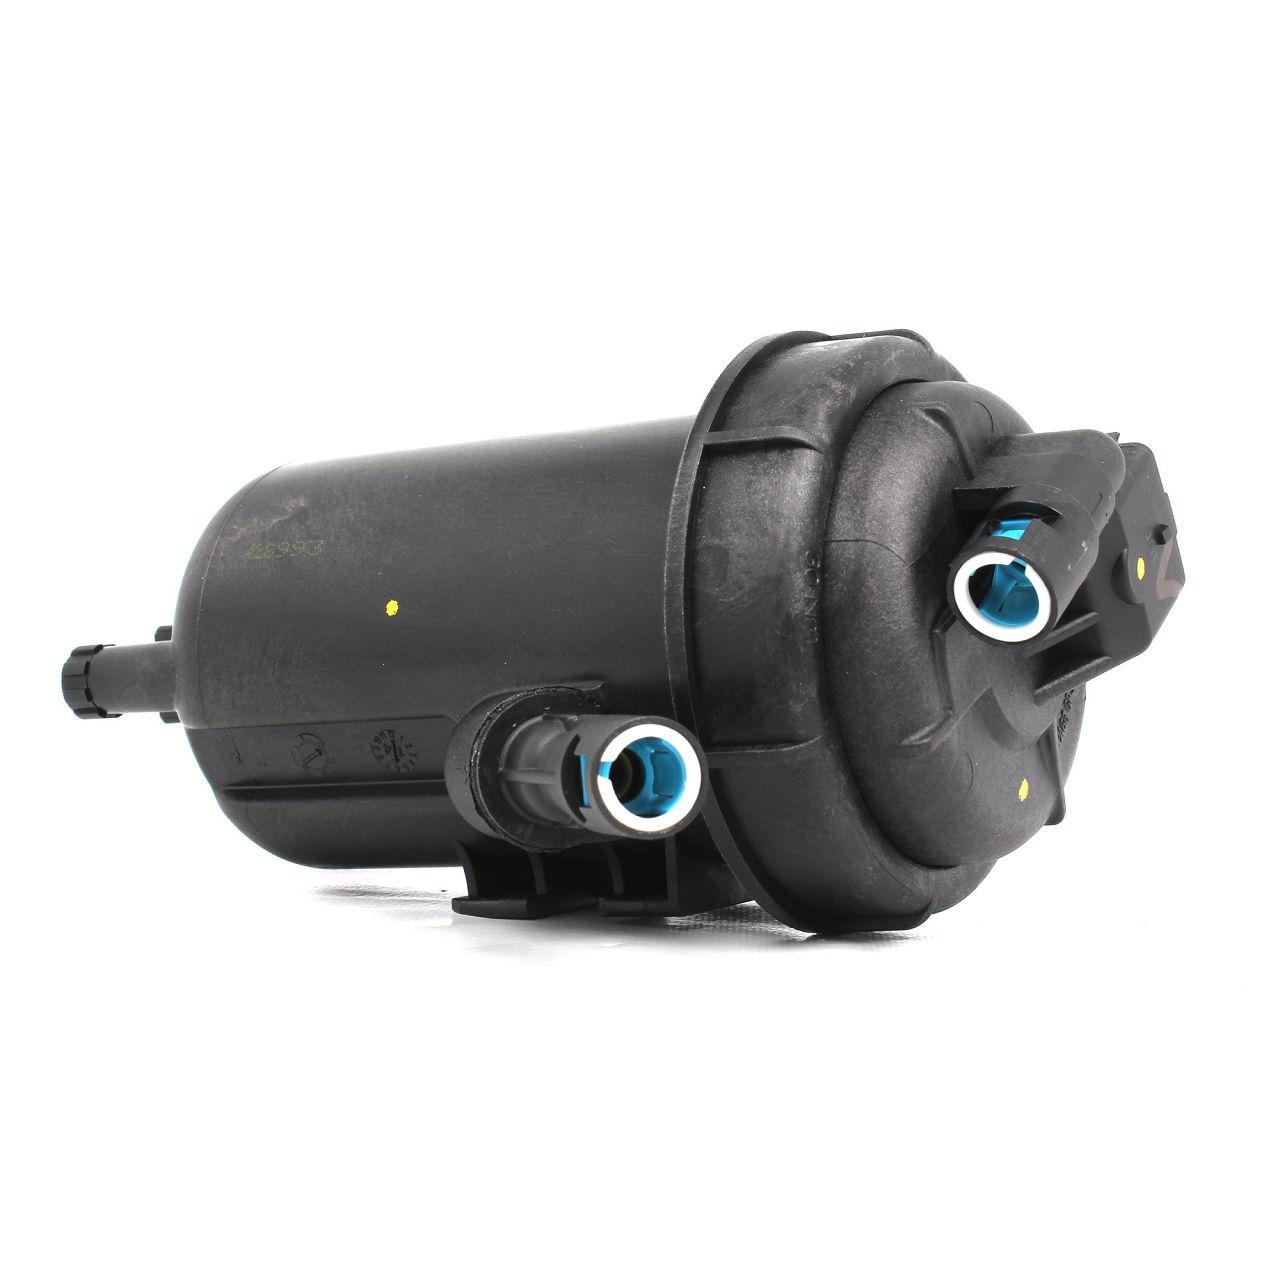 UFI Kraftstofffilter Dieselfilter + Gehäuse für Opel Astra H Zafira B 1.9CDTI